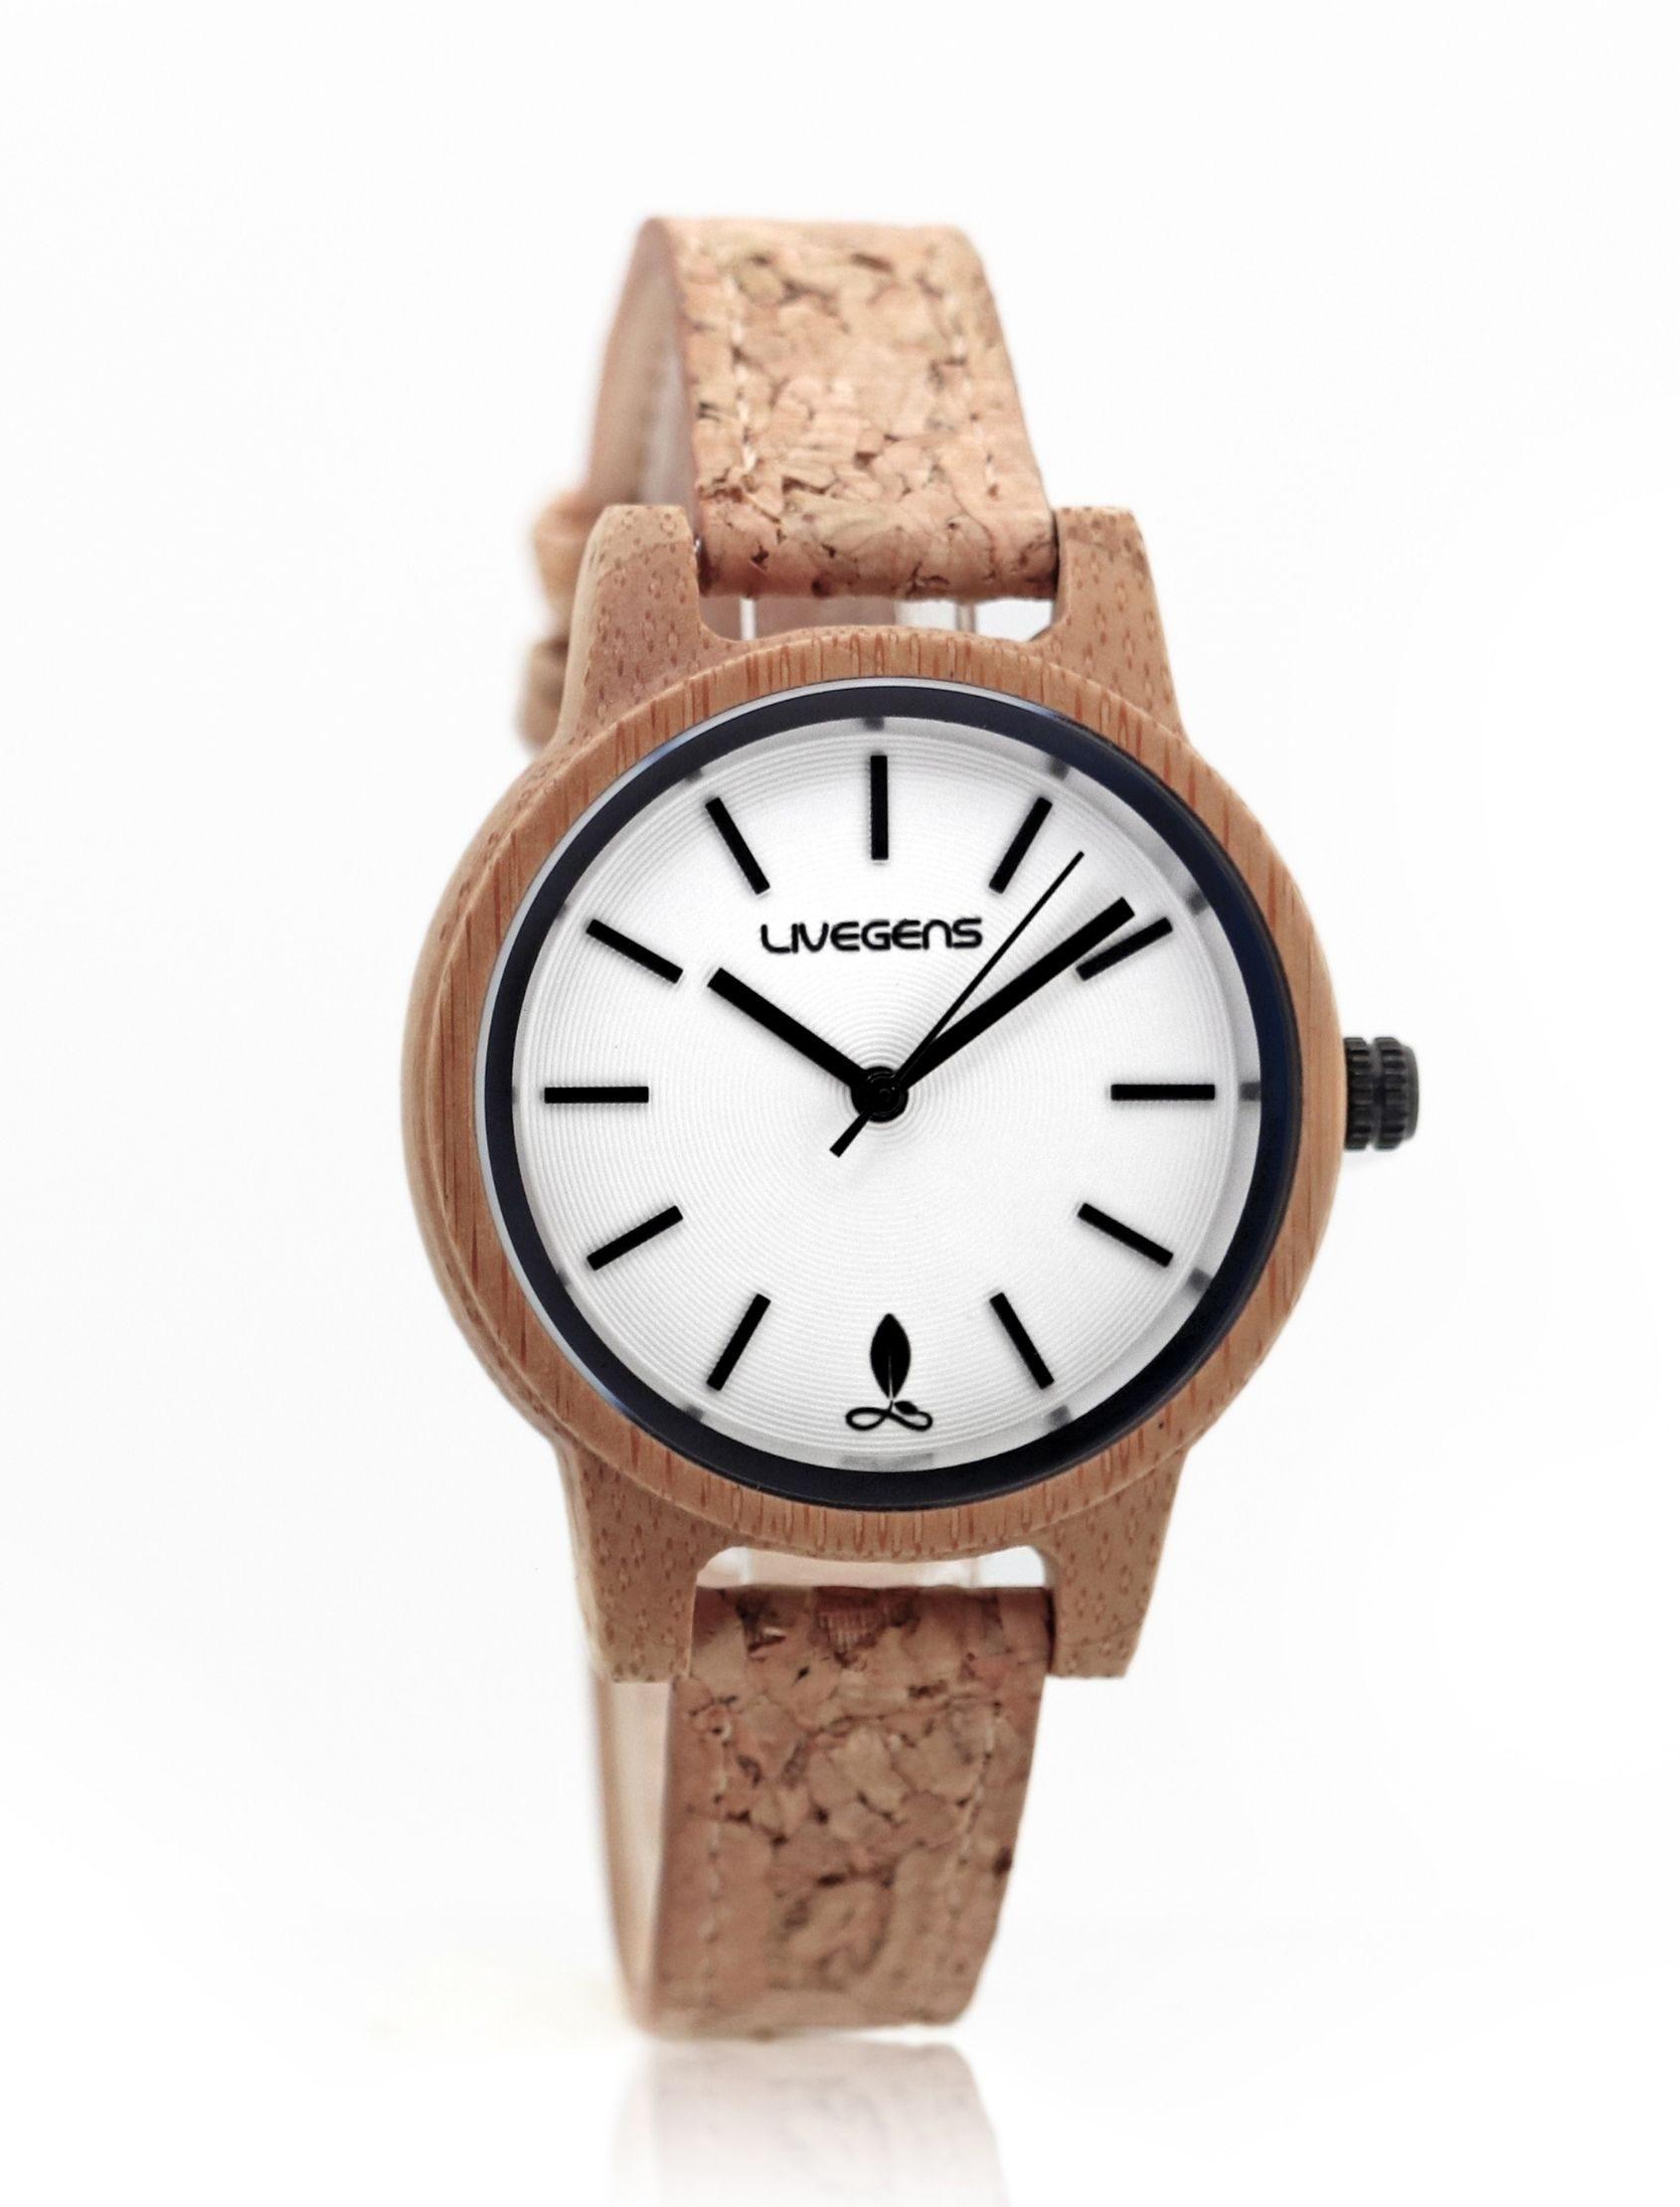 reloj livegens corkland de madera con correa de corcho